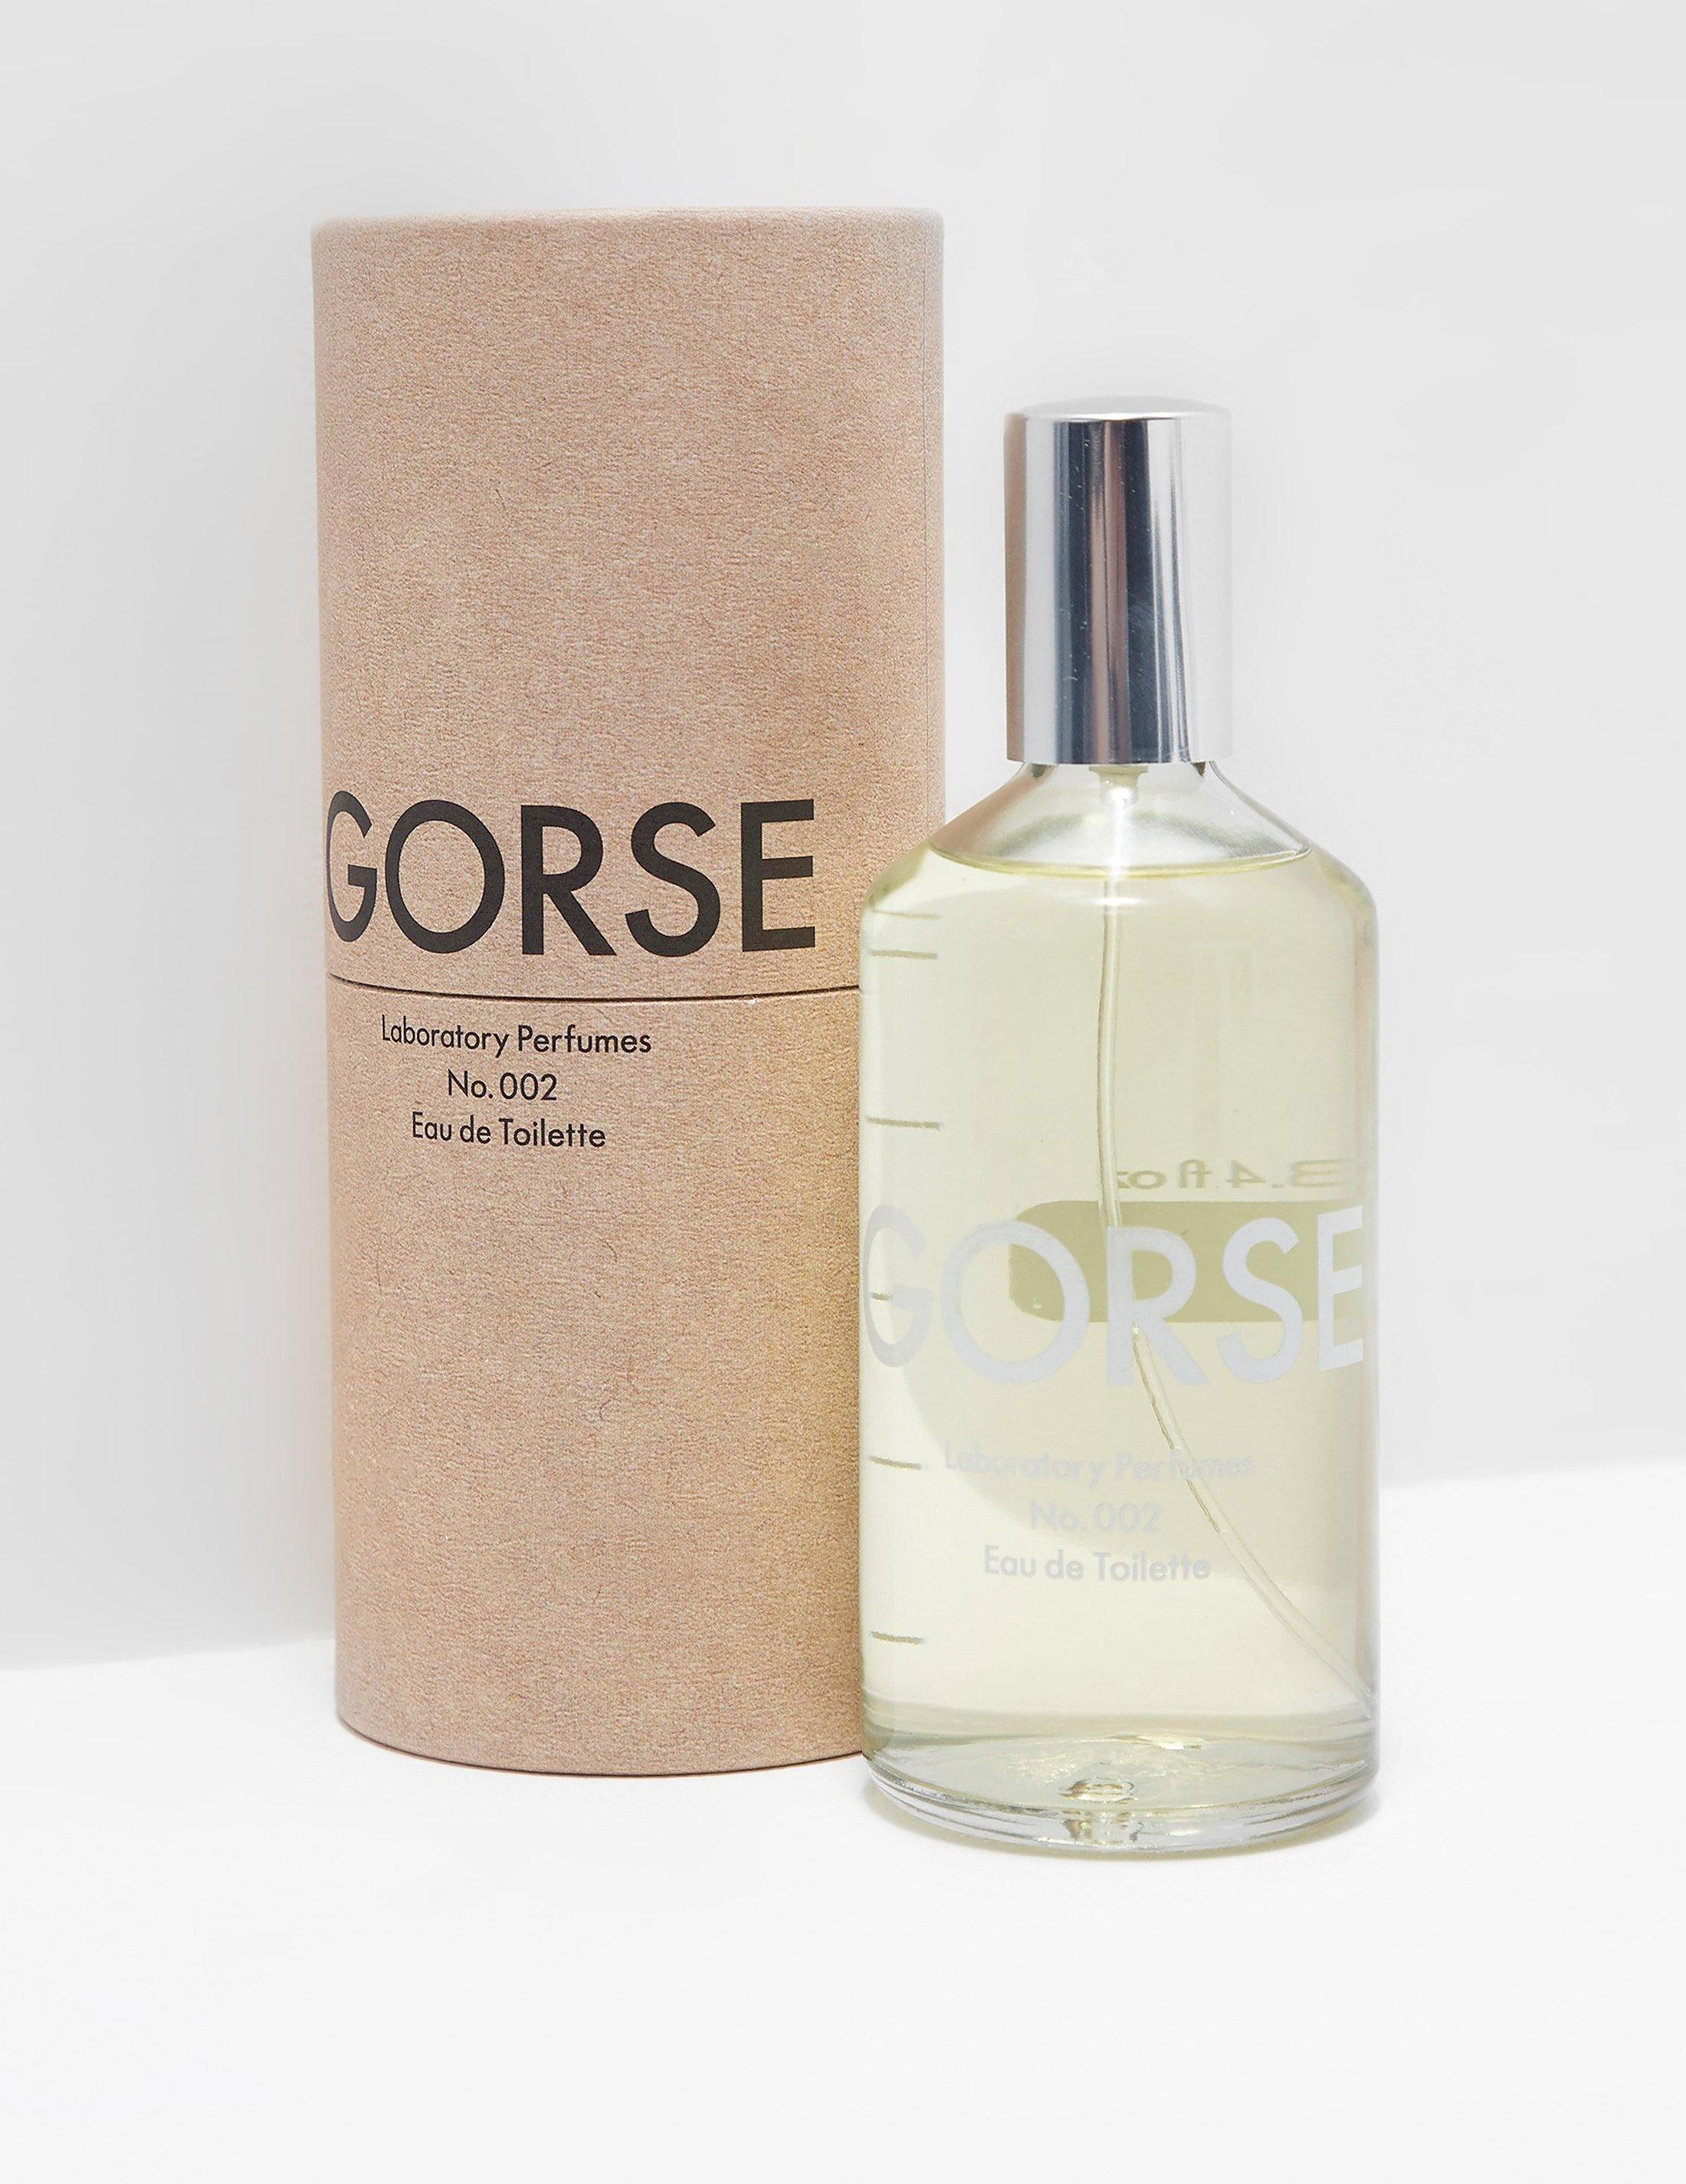 Laboratory Perfumes Gorse Eau De Toilette